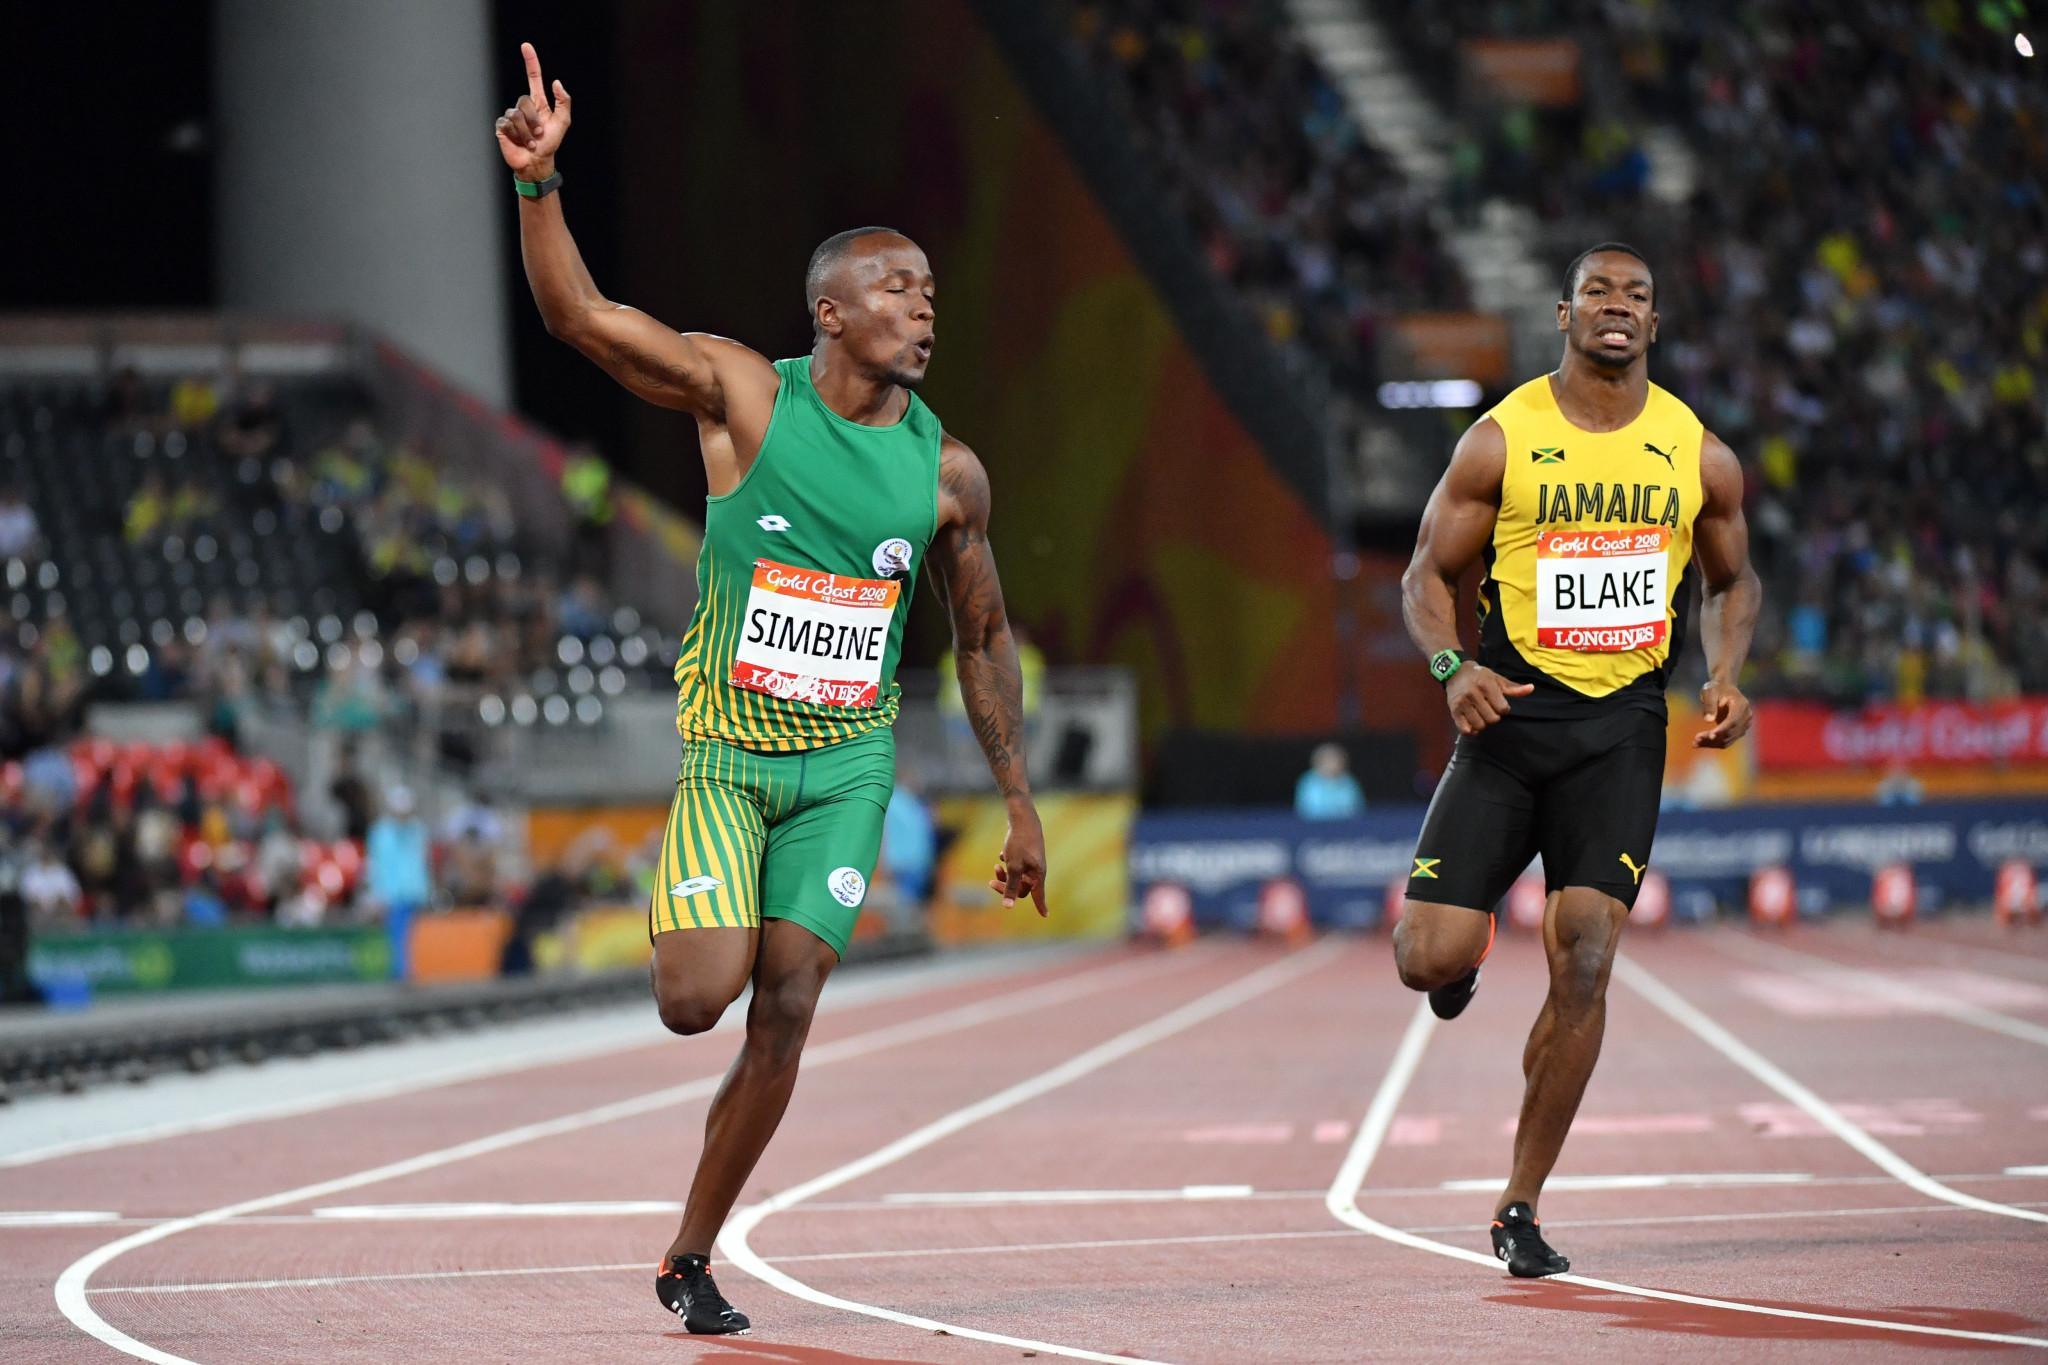 Simbine stuns Blake to win Commonwealth Games 100 metres